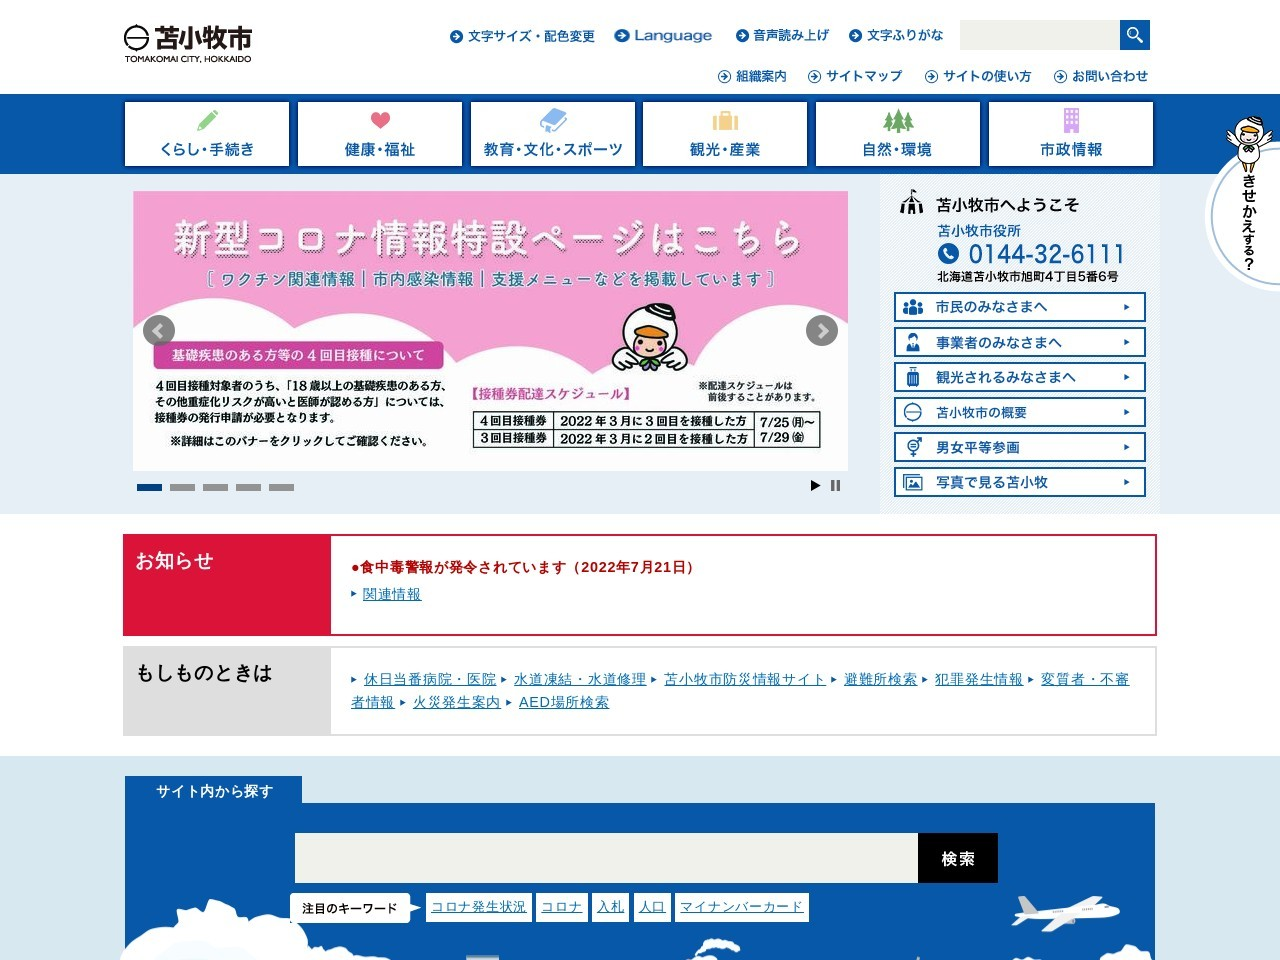 http://www.city.tomakomai.hokkaido.jp/kurashi/bosai/kotsuanzen/anzen20.html